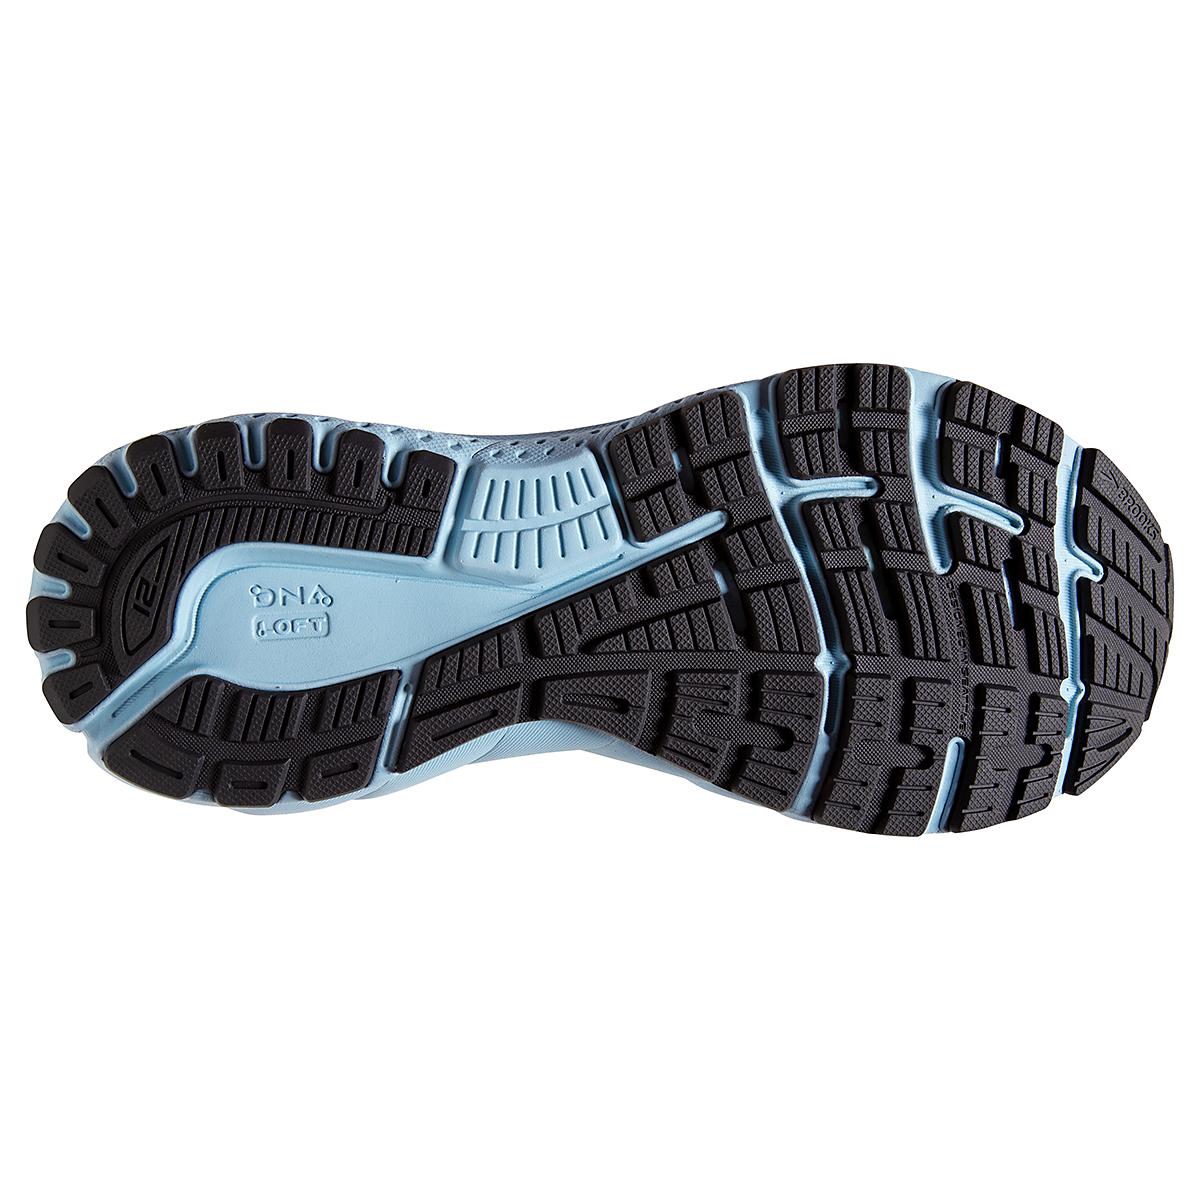 Women's Brooks Adrenaline GTS 21 Running Shoe - Color: White/Alloy - Size: 5 - Width: Regular, White/Alloy, large, image 5